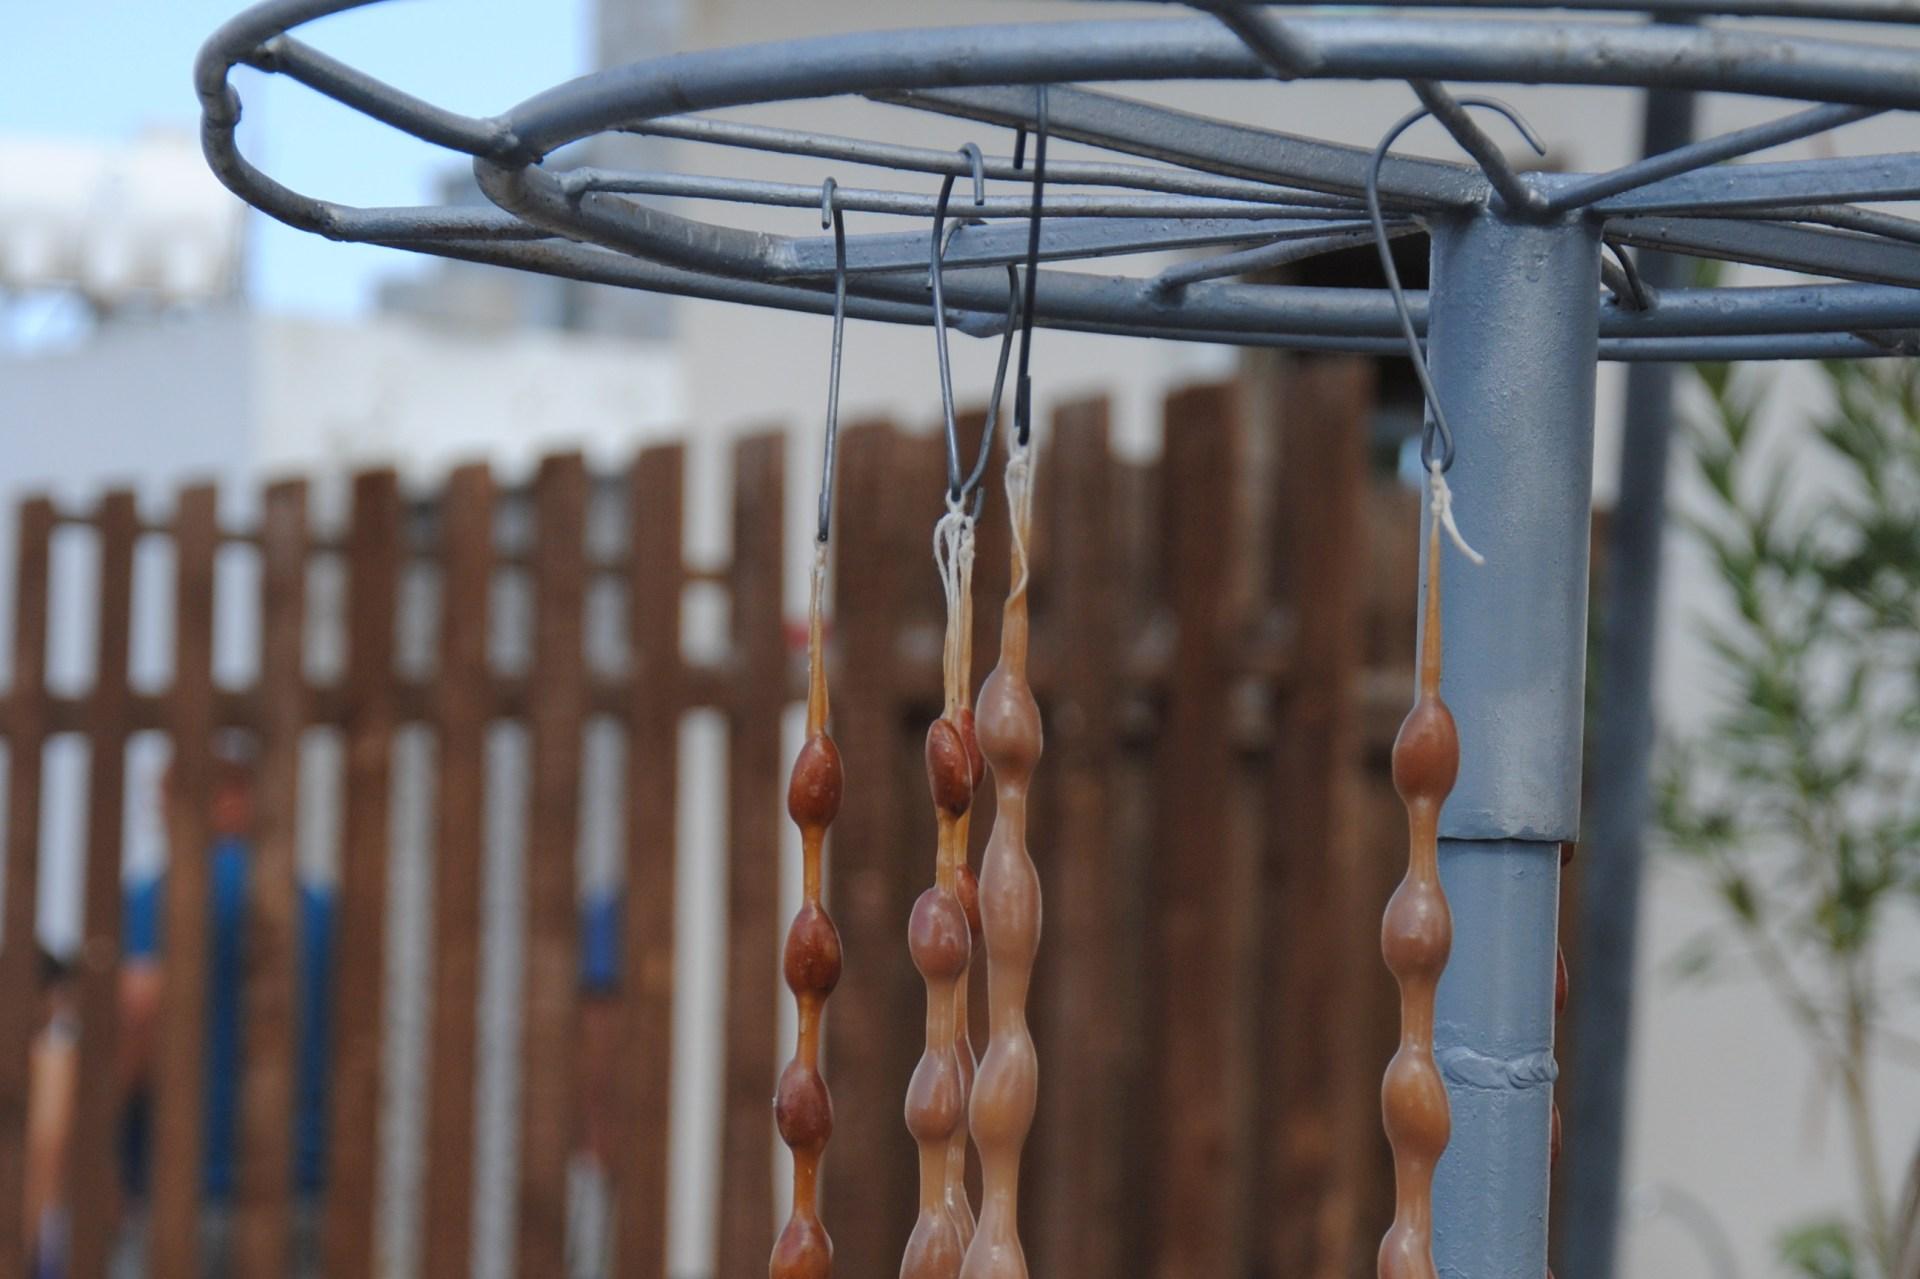 Mandeln in Johannisbrotsirup hängen an einem Gerüst